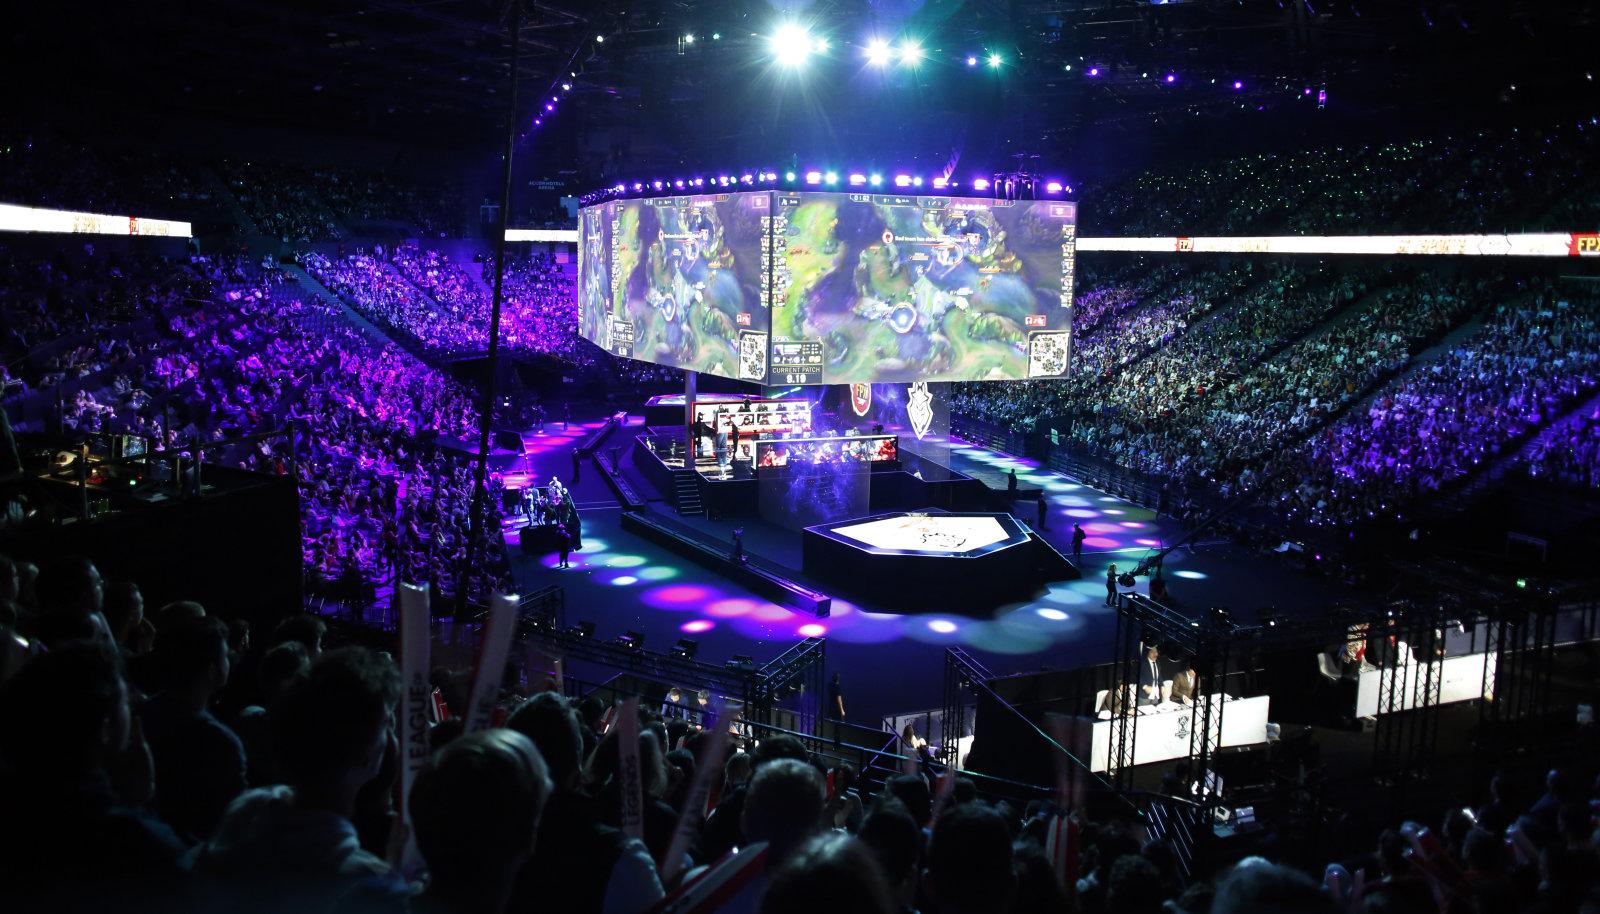 Блоги, Dota 2, Counter-Strike: Global Offensive, компьютерные игры, Warcraft 3: Reforged, Rocket League, Quake, Age of Empires 2: Definitive Edition, Fortnite, FIFA 21, Valorant